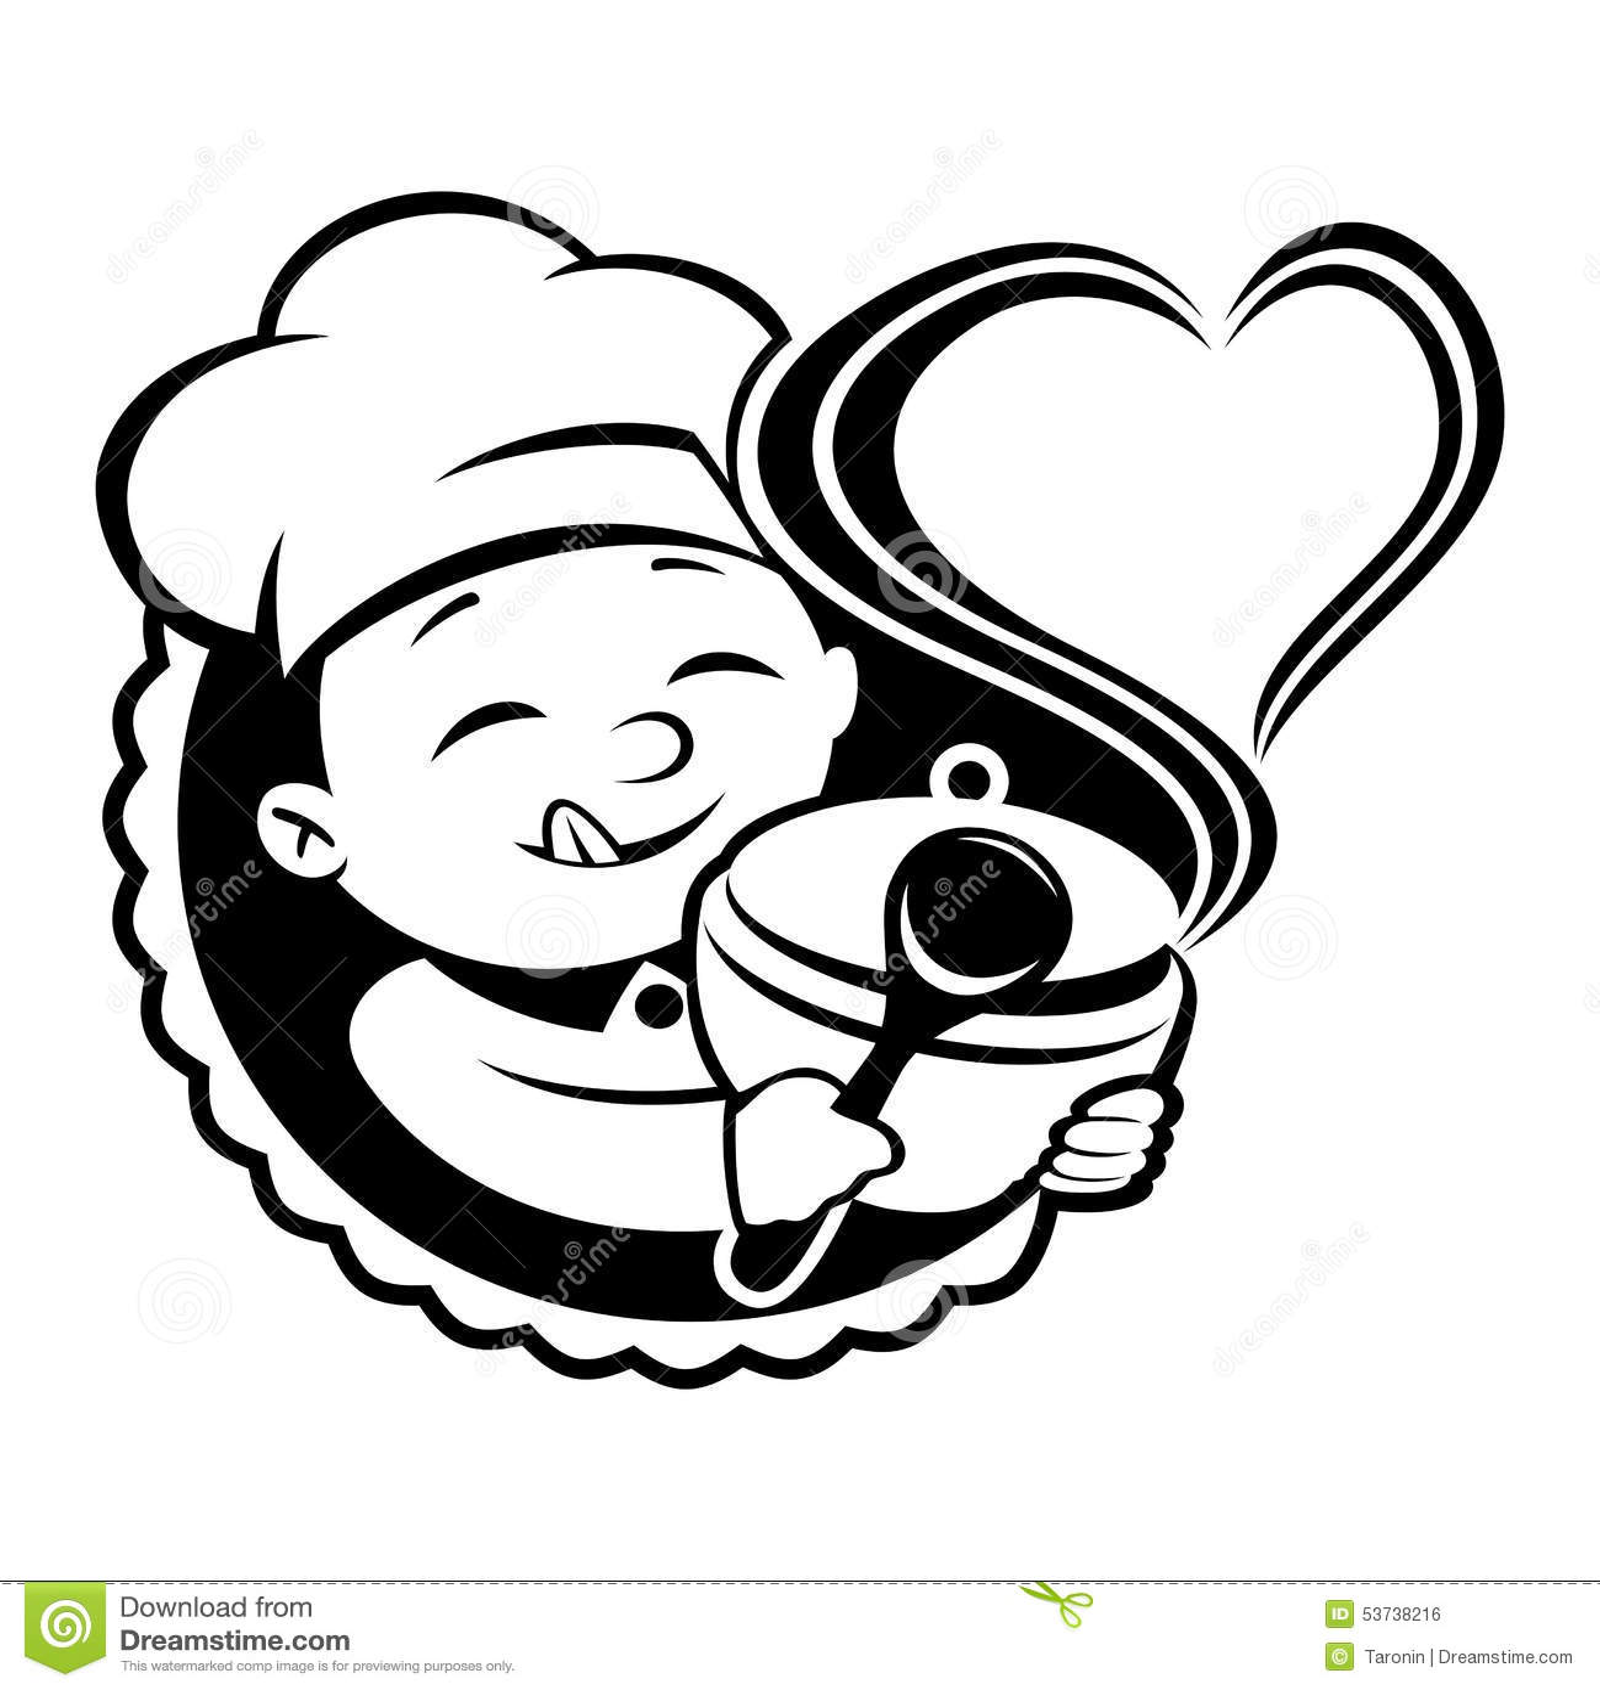 Vecteur de signe cuisinier